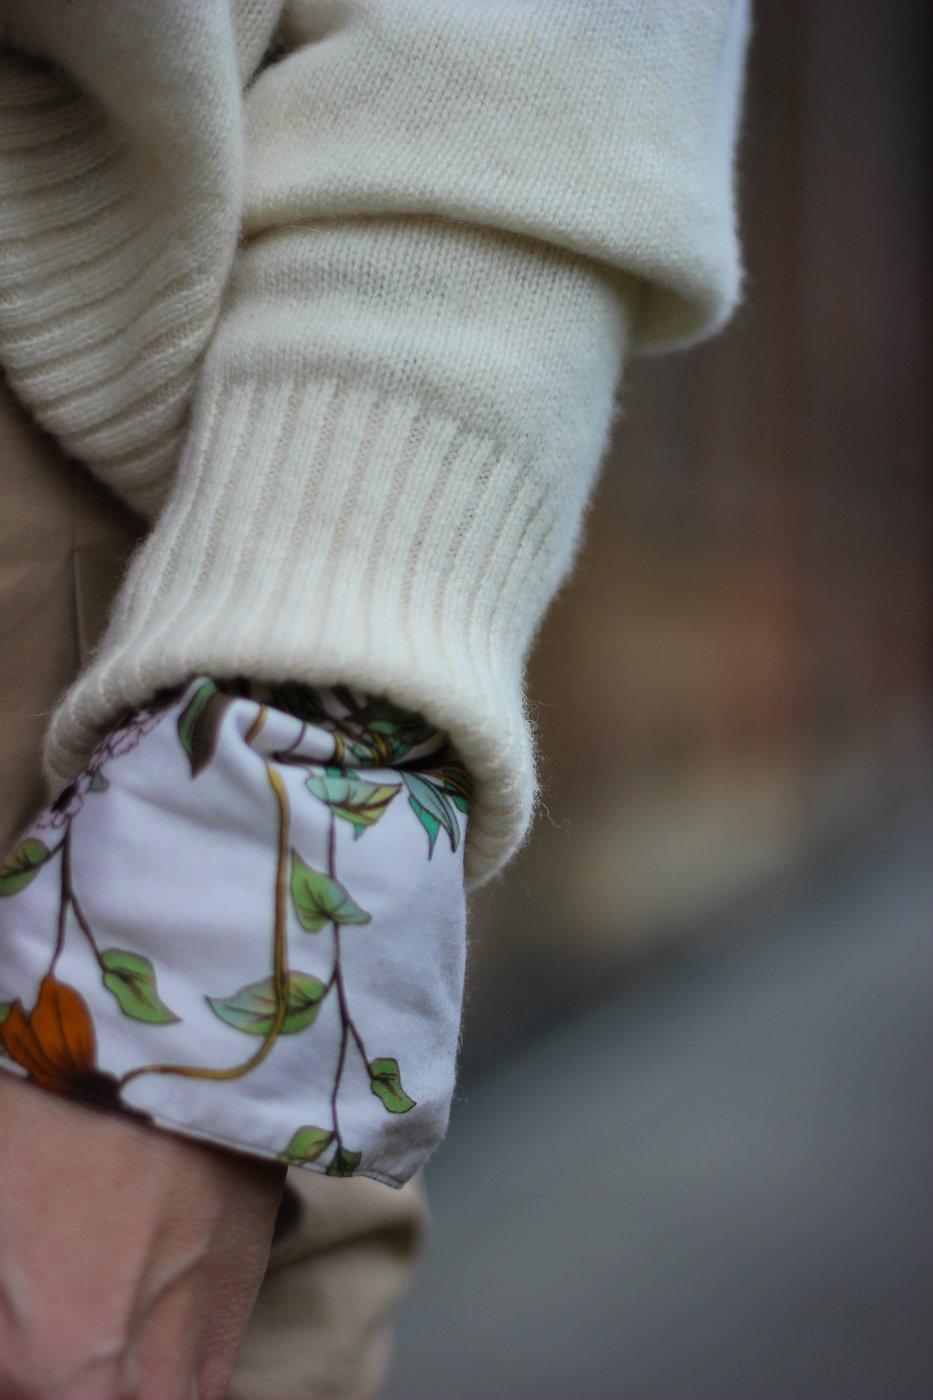 conny doll lifestyle: Schluppenbluse mit Strickpullover, Details